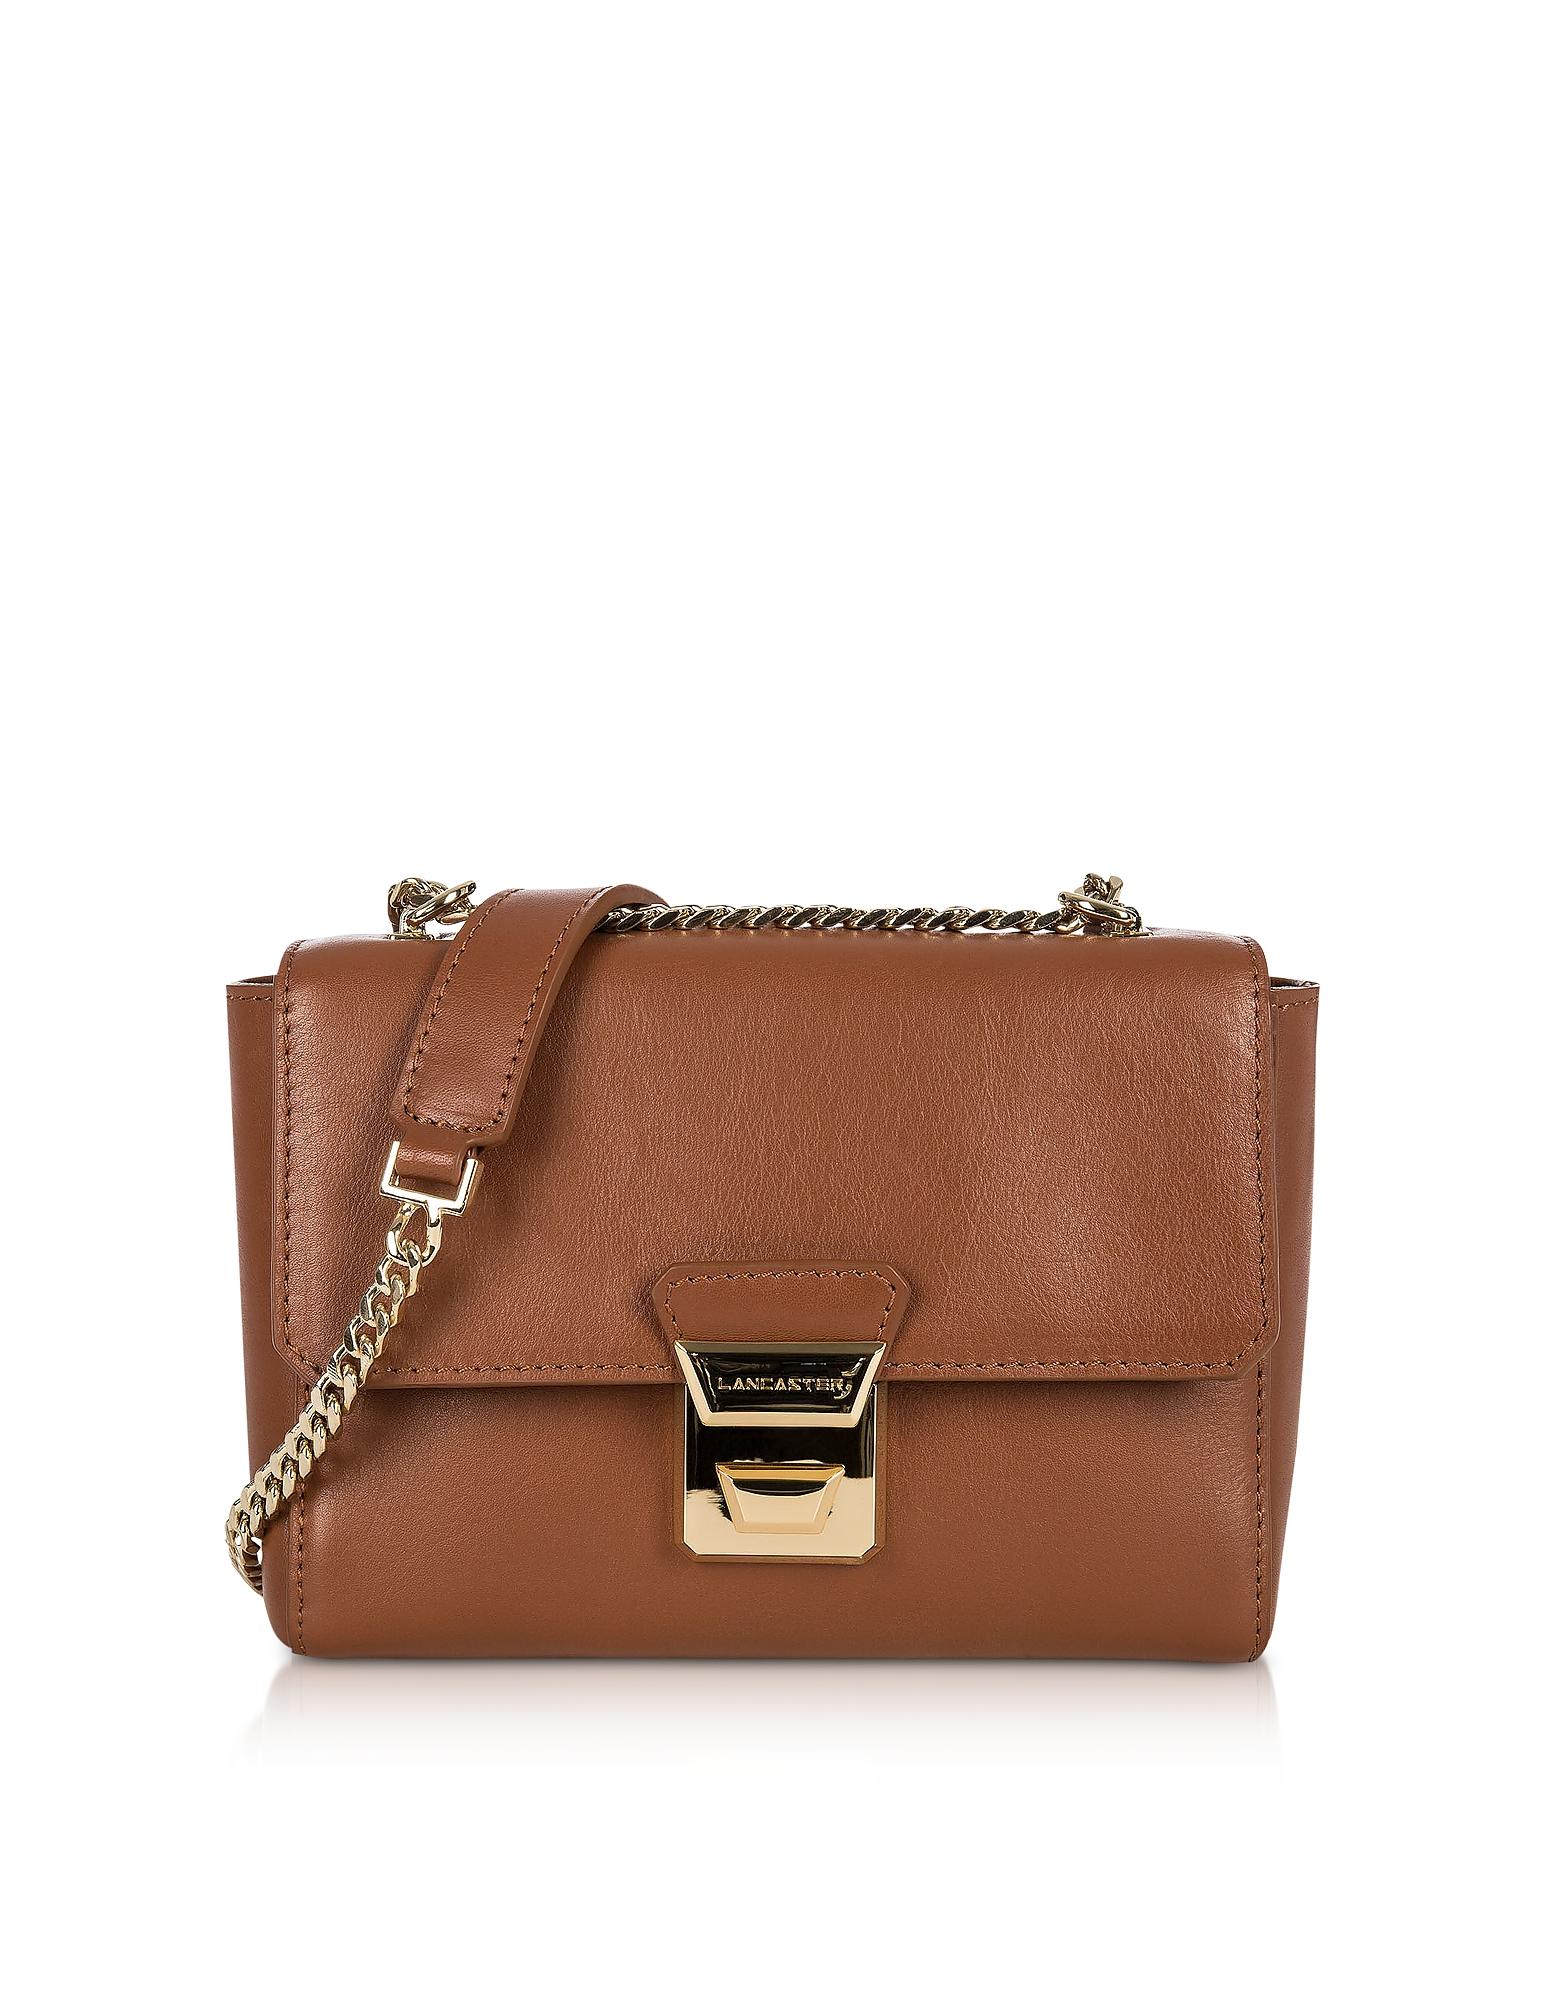 Lancaster Paris Handbags, Gena Or Leather Small Crossbody Bag